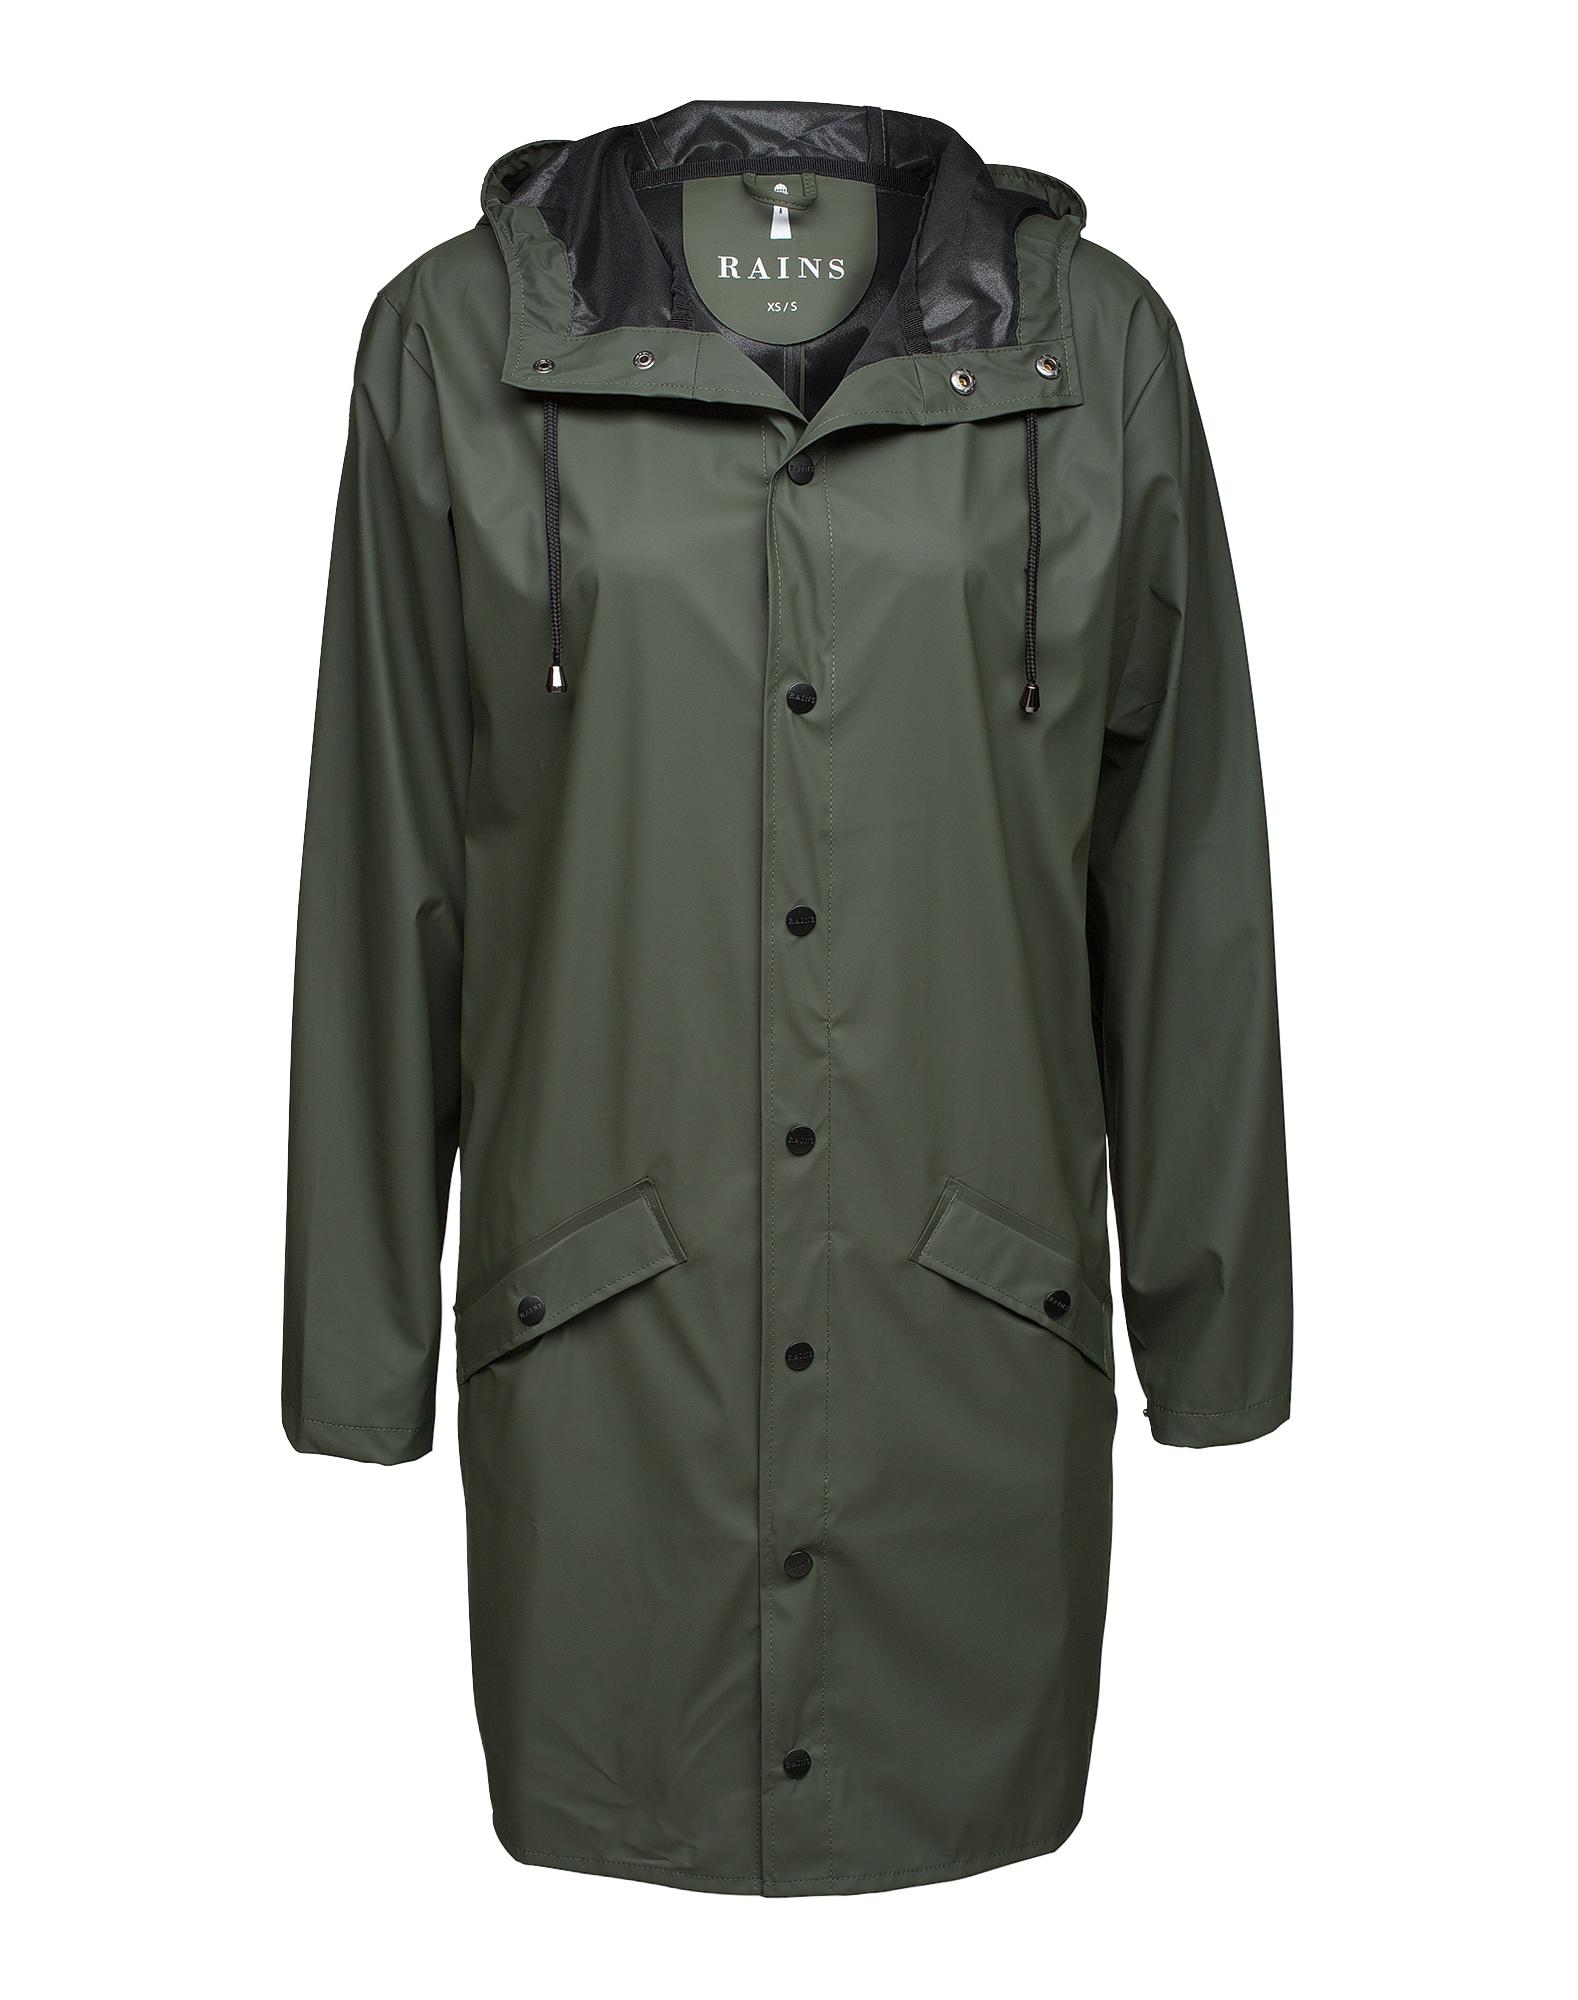 RAINS Demisezoninis paltas alyvuogių spalva